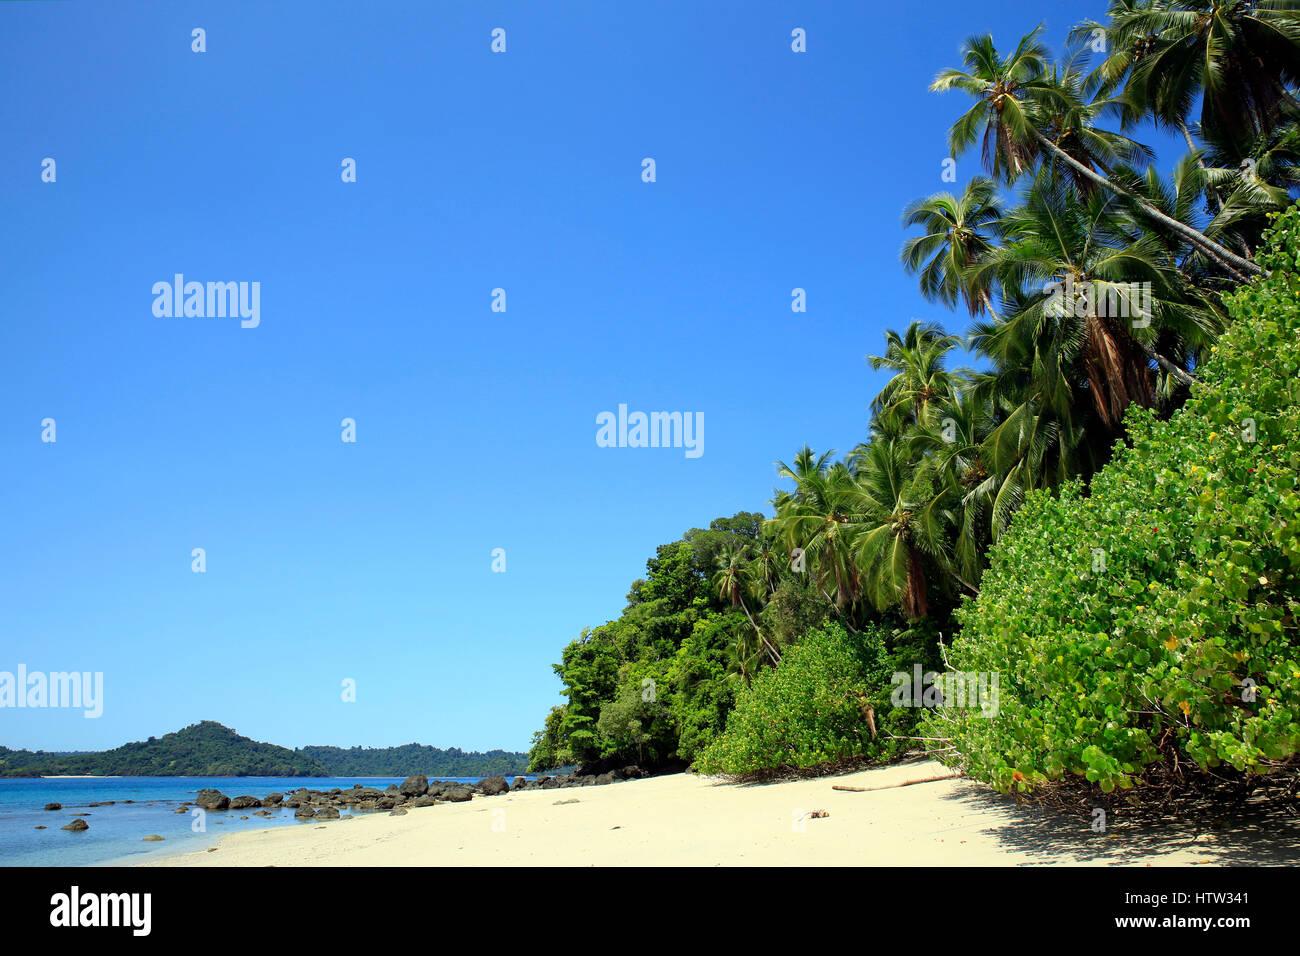 Tropical Beach of Coibita, aka Rancheria, with Isla Coiba in the Background. Coiba National Park, Panama Stock Photo